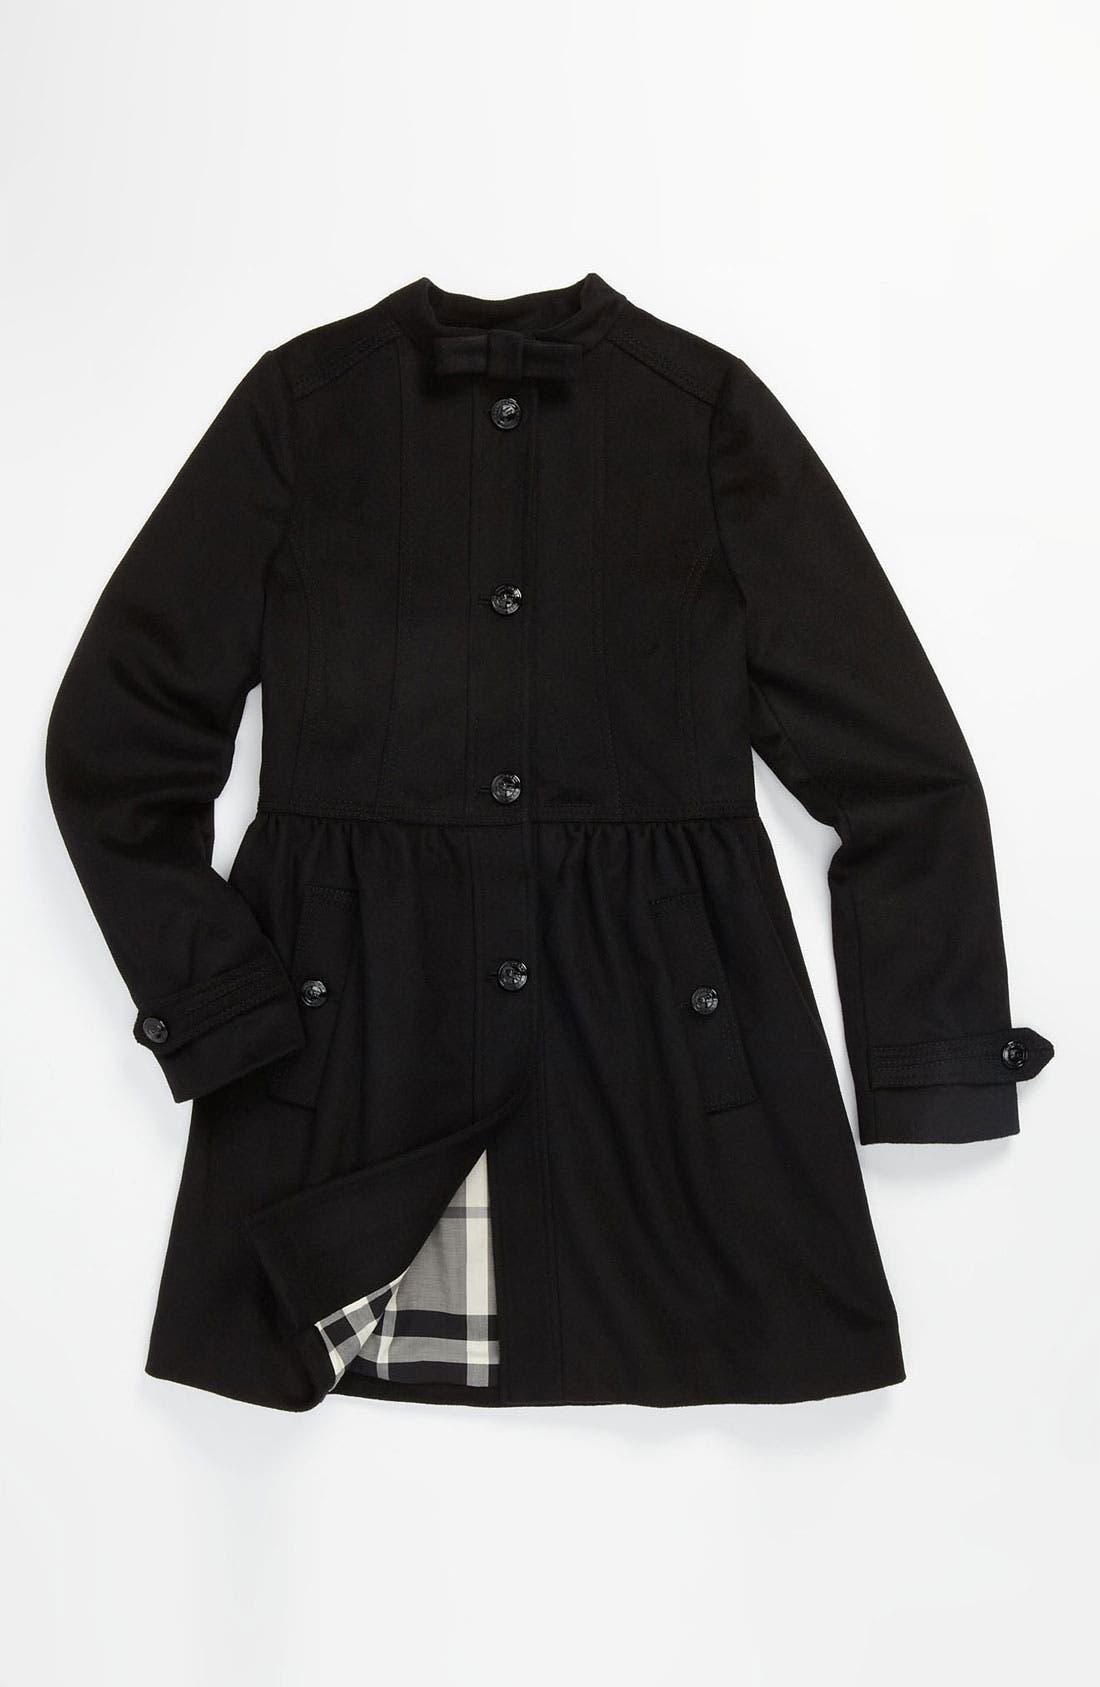 Main Image - Burberry Wool Blend Peacoat (Little Girls & Big Girls)